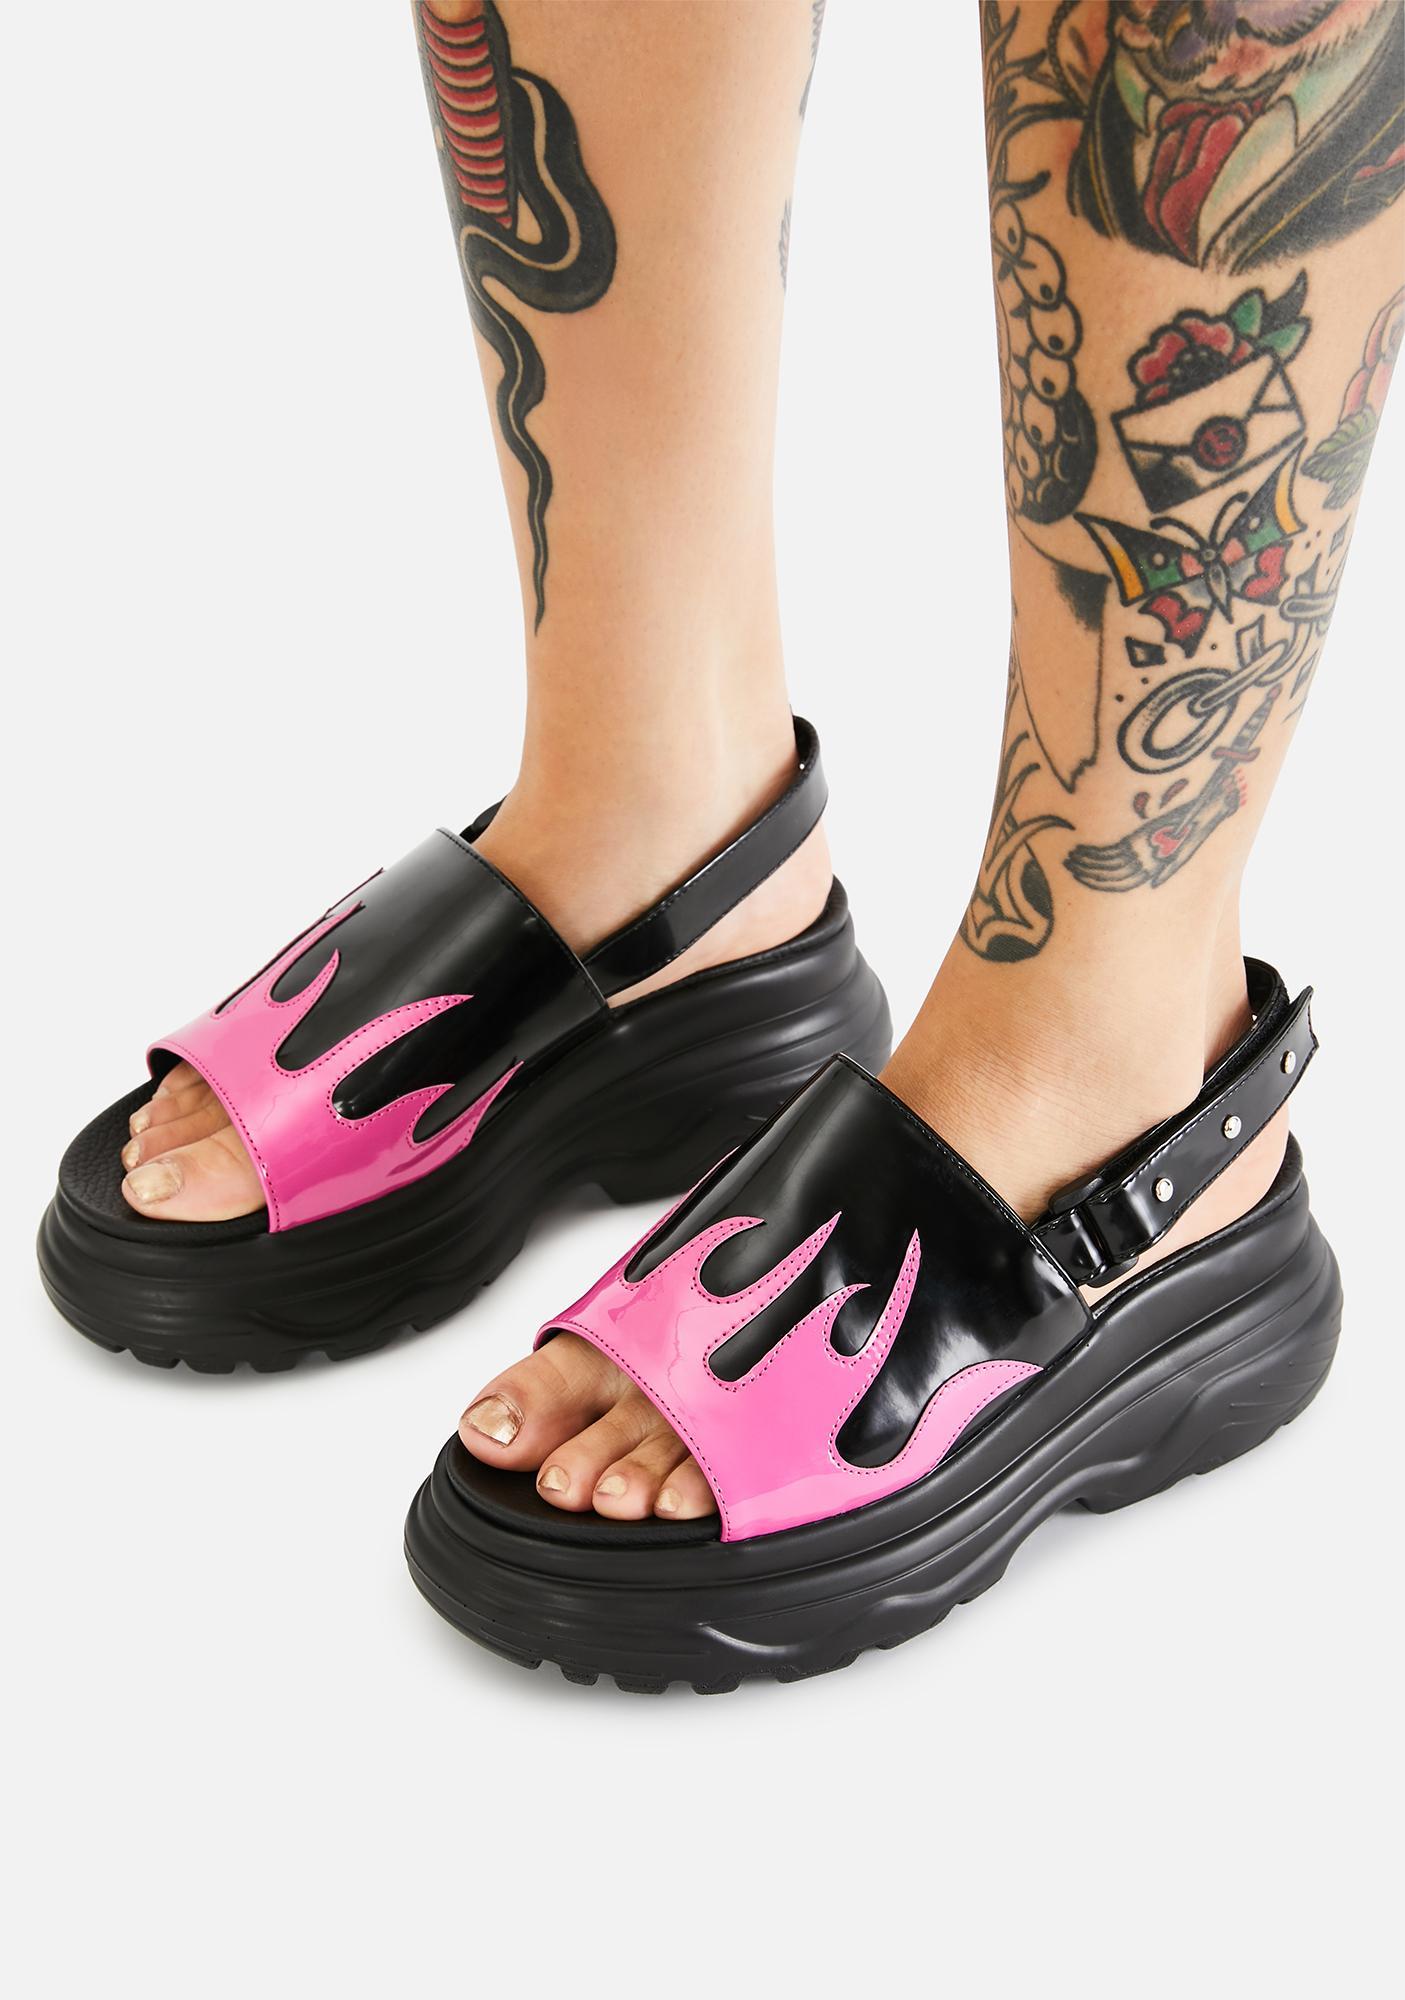 Koi Footwear Pink Ebo Flame Sandals